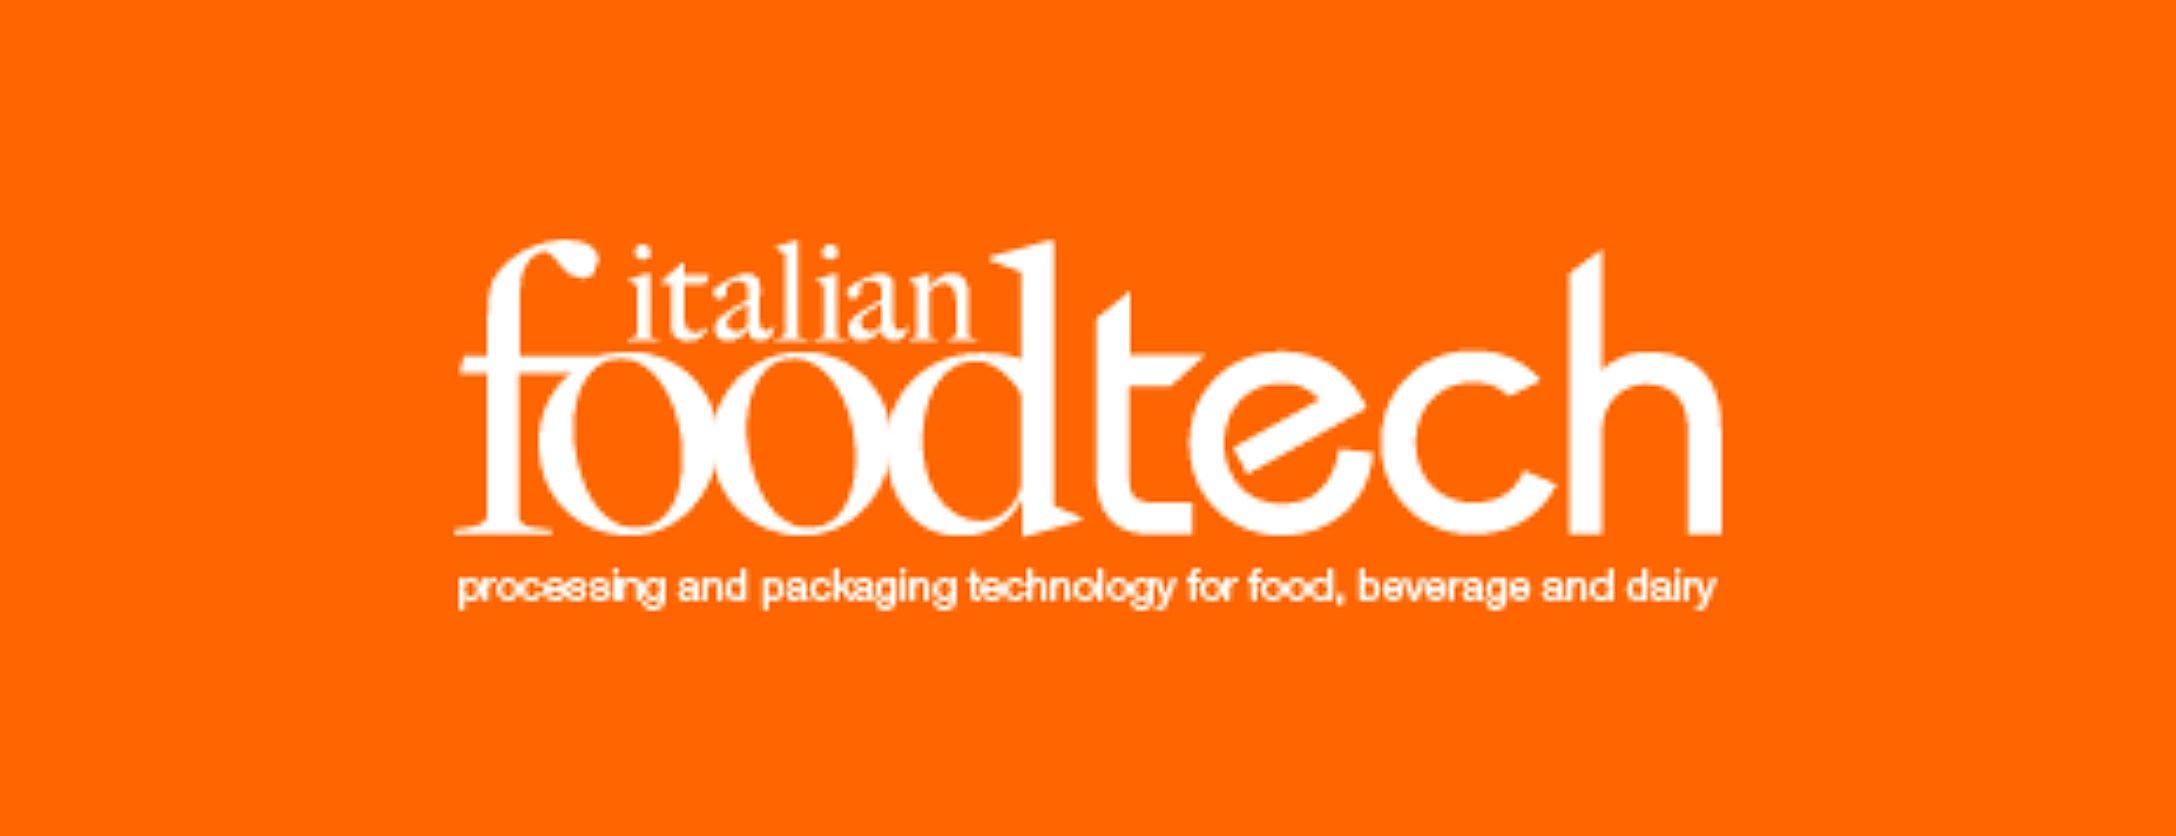 Italian Foodtech